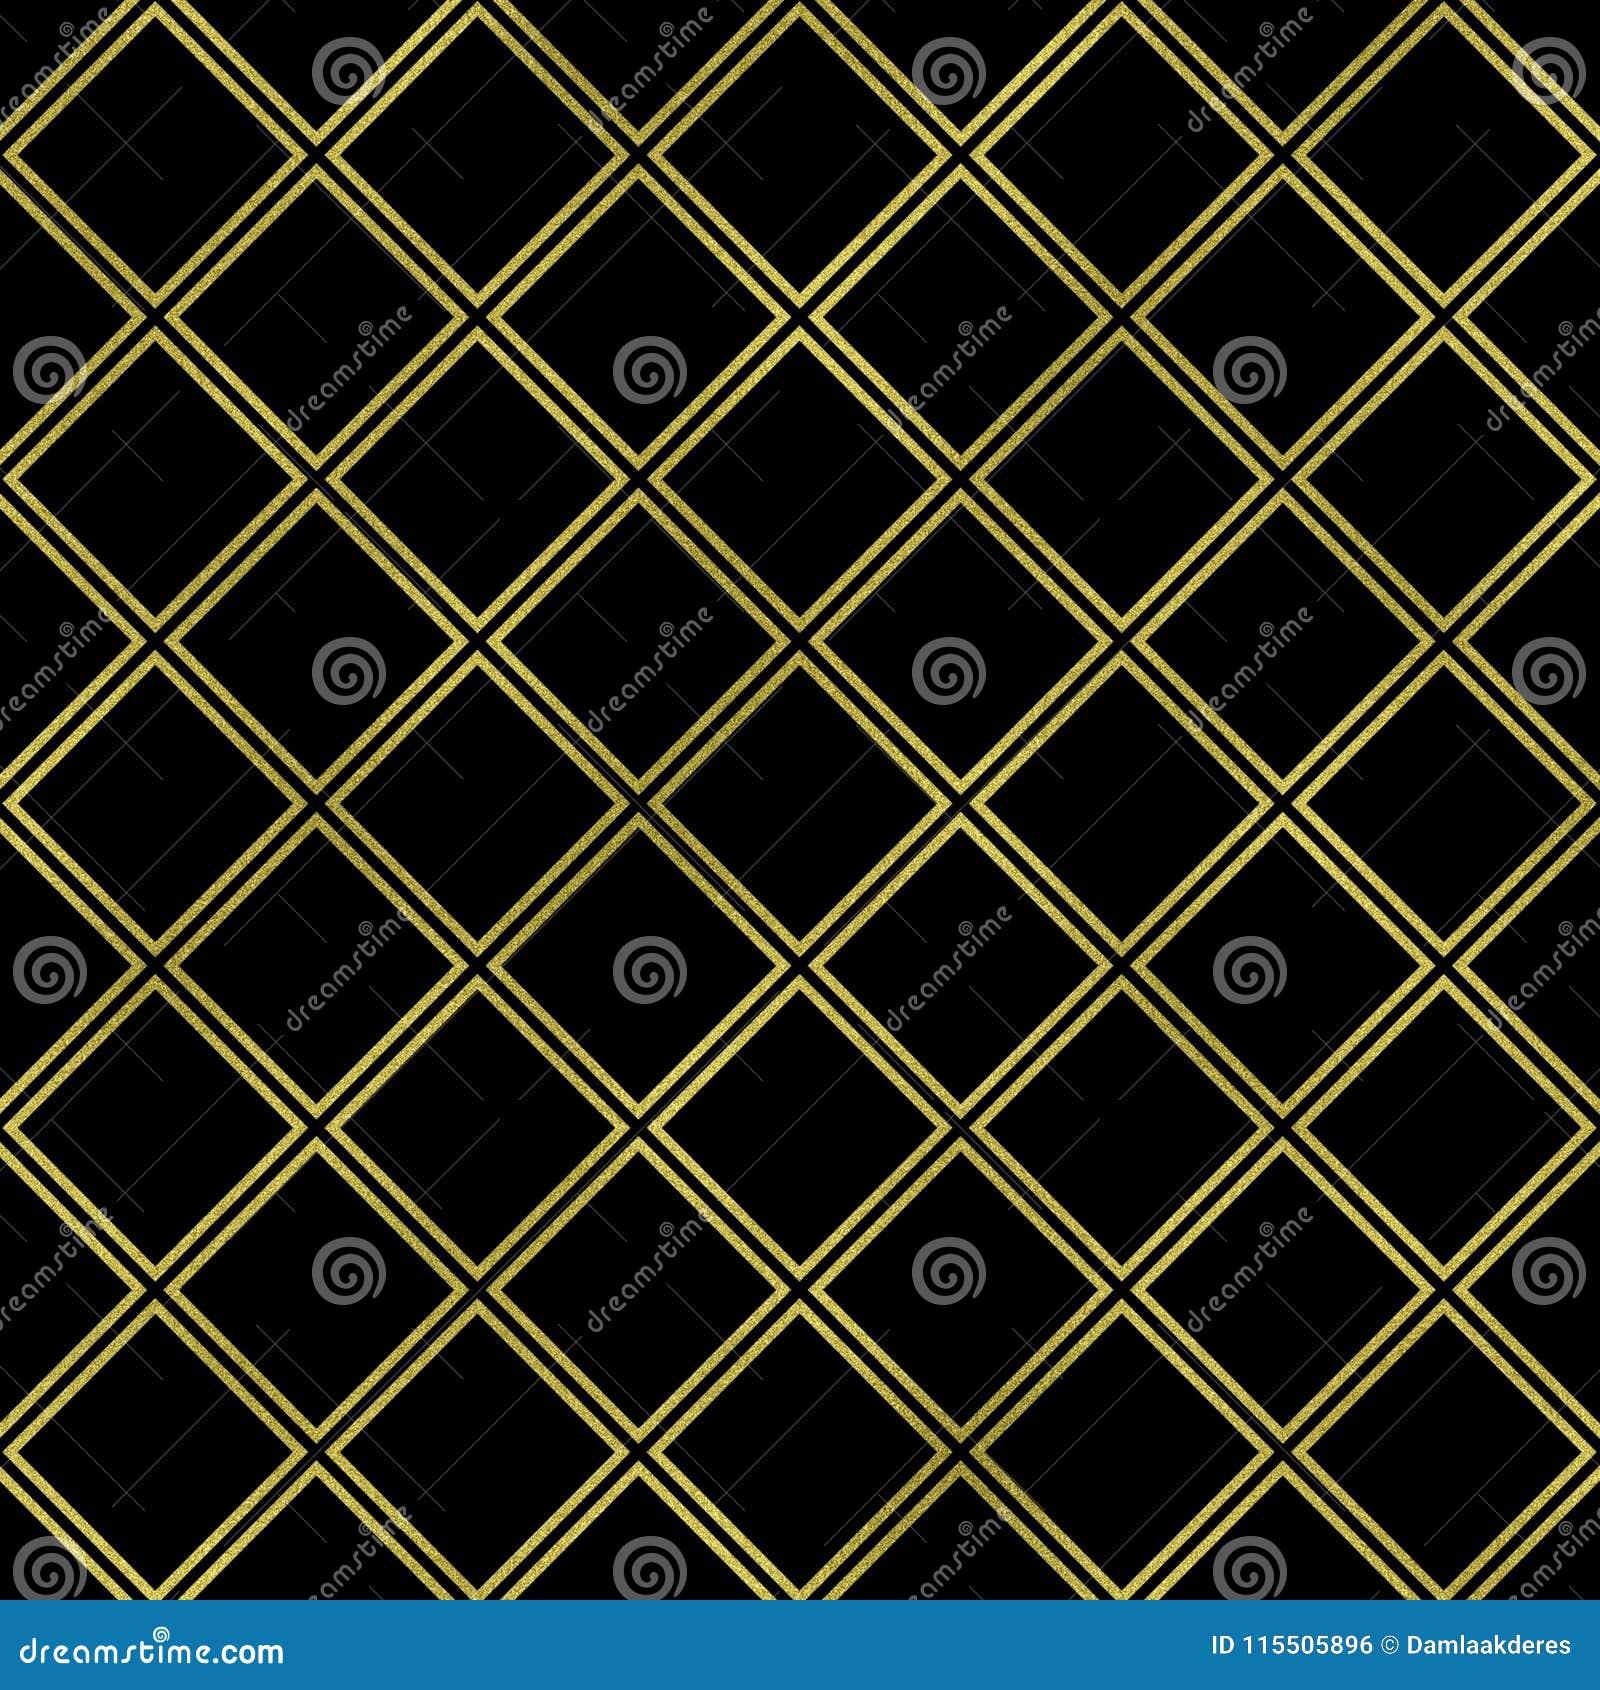 Gold Square On Black Background Gold Square Texture Glitter Geometric Pattern Glitter Geometric Wallpaper Stock Illustration Illustration Of Vectorial Background 115505896